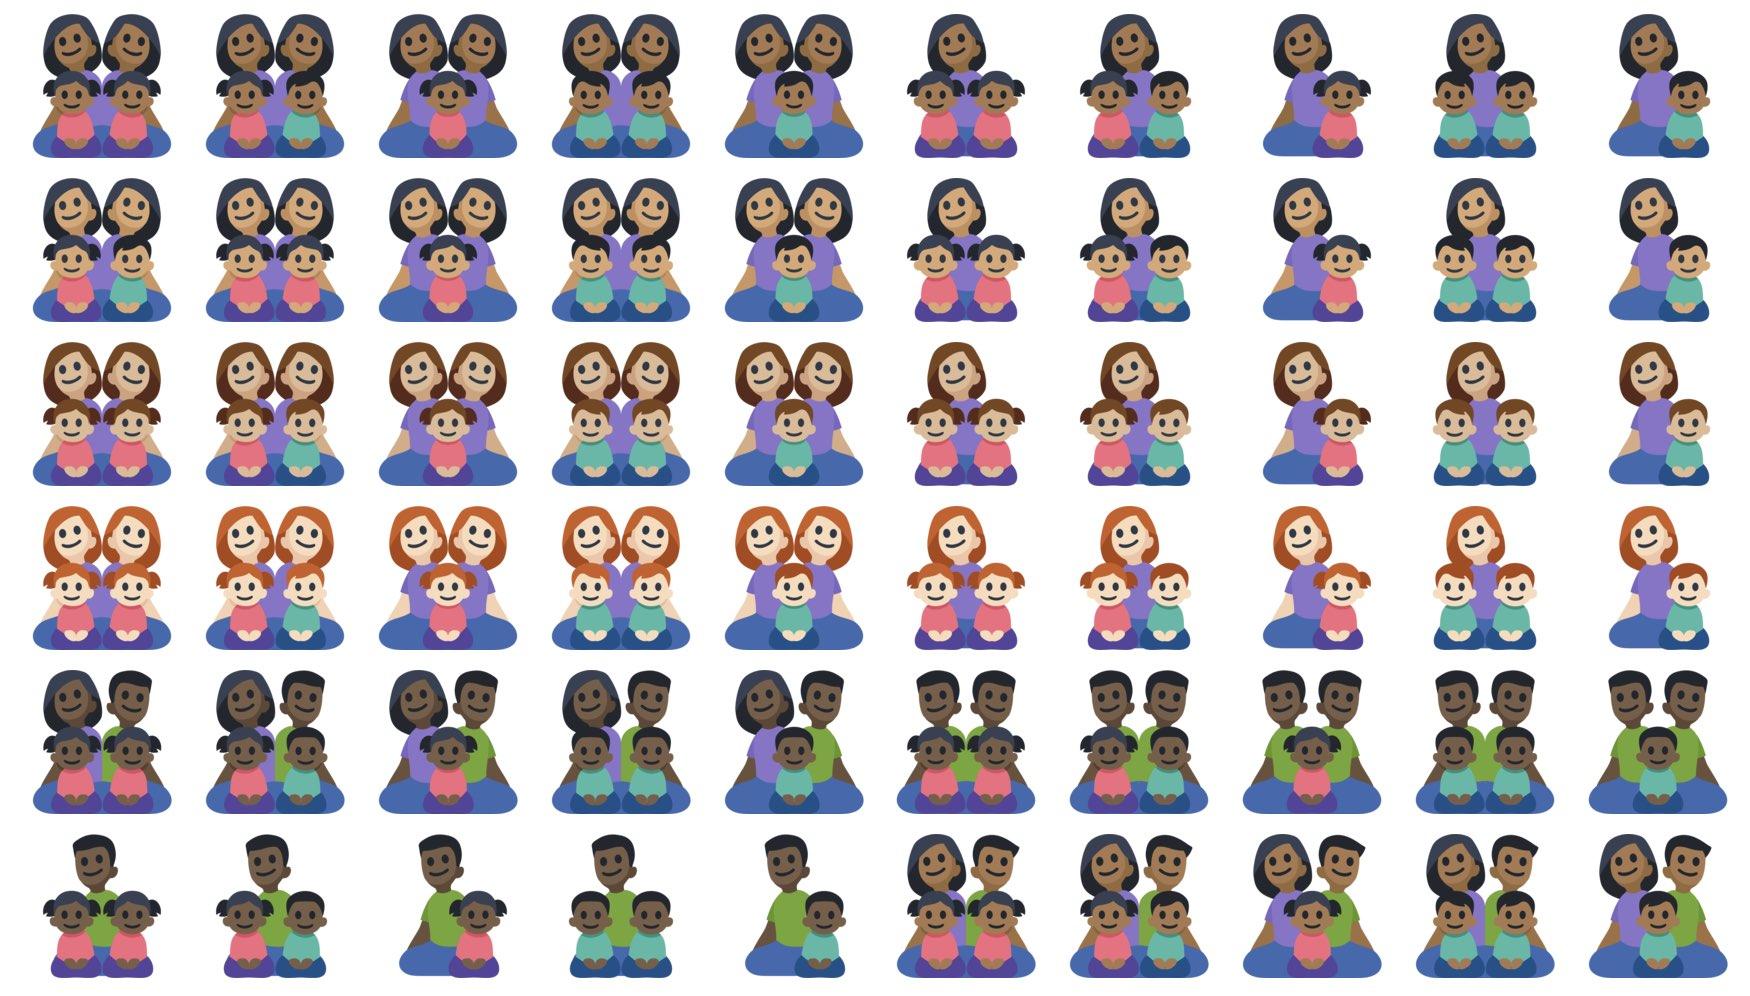 facebook-emoji-families-emojipedia-2.2